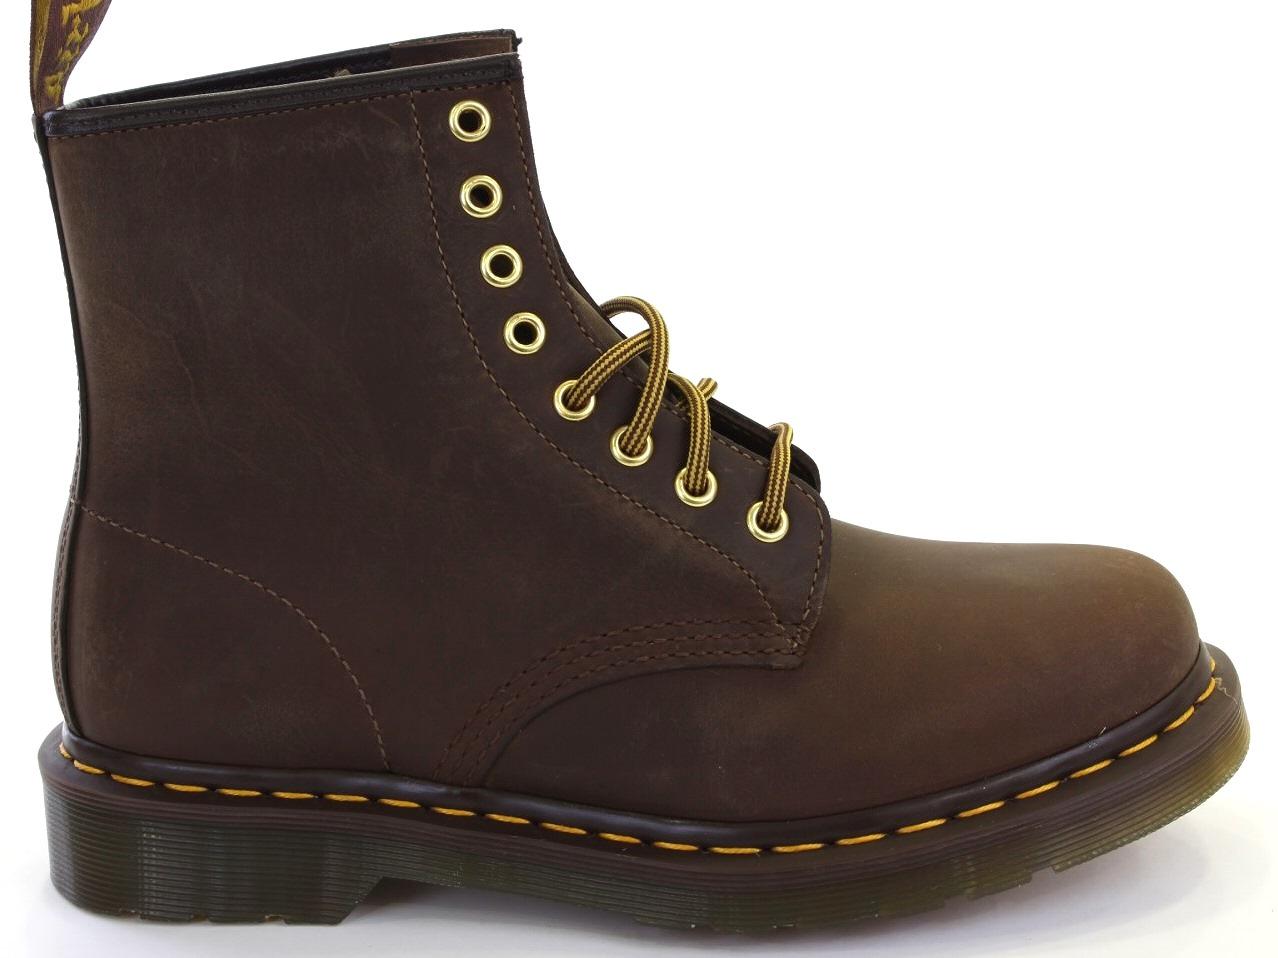 Flat Ankle Boots Dr. Martens - 689 BOTA 1460 8 EYE